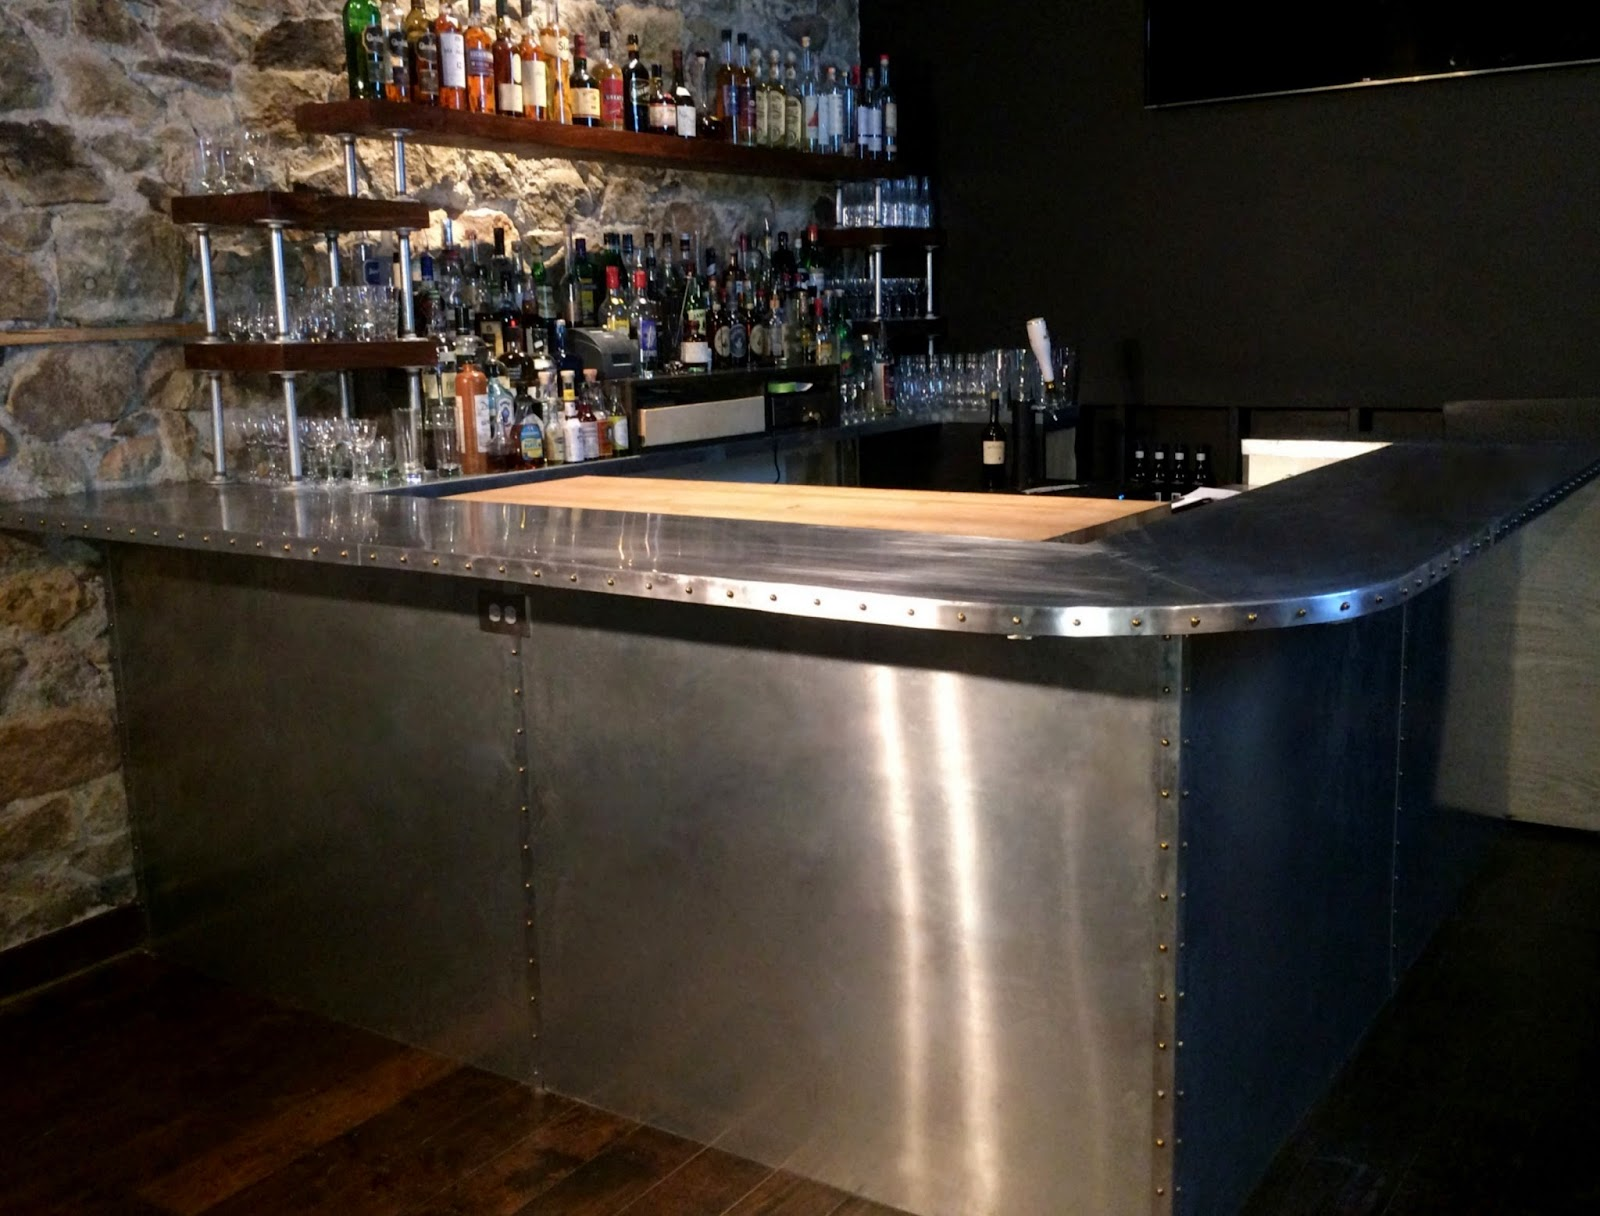 cook-tavern-zinc-bar-16379517361-o.jpg